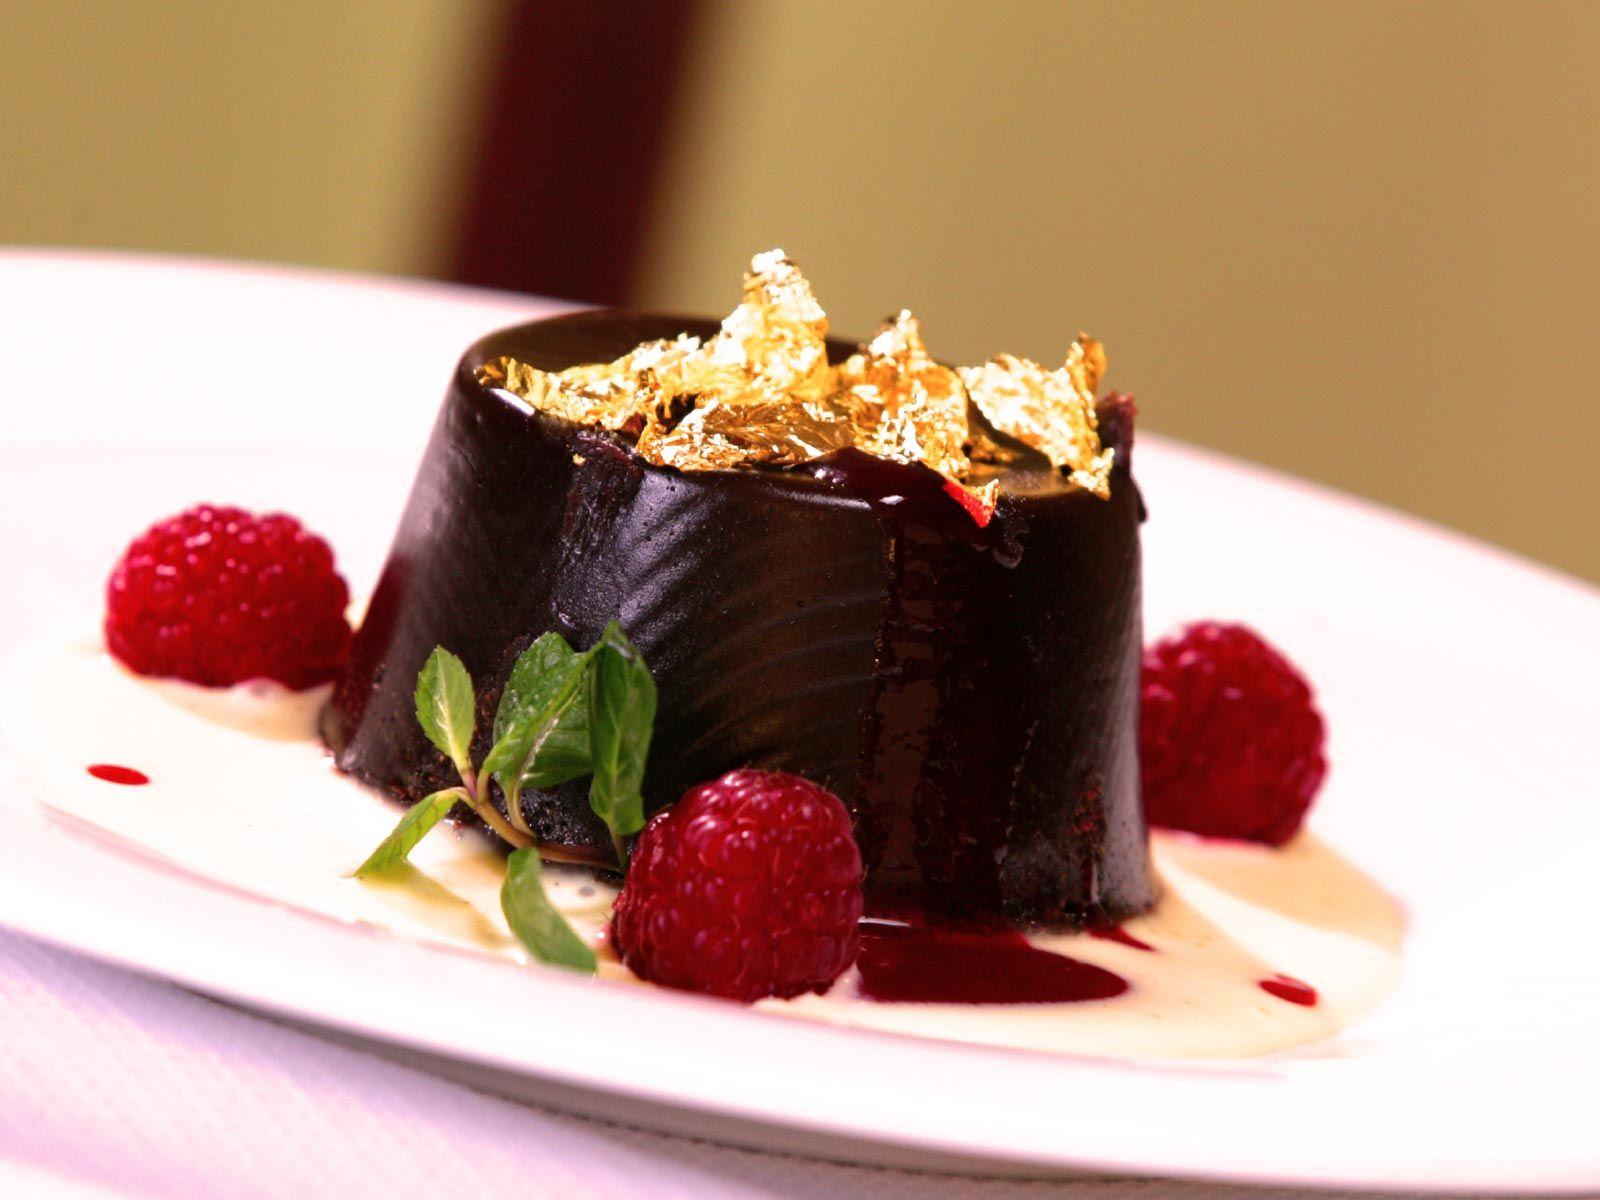 chocolate cake hd desktop wallpaper 1600 215 1200 bakery